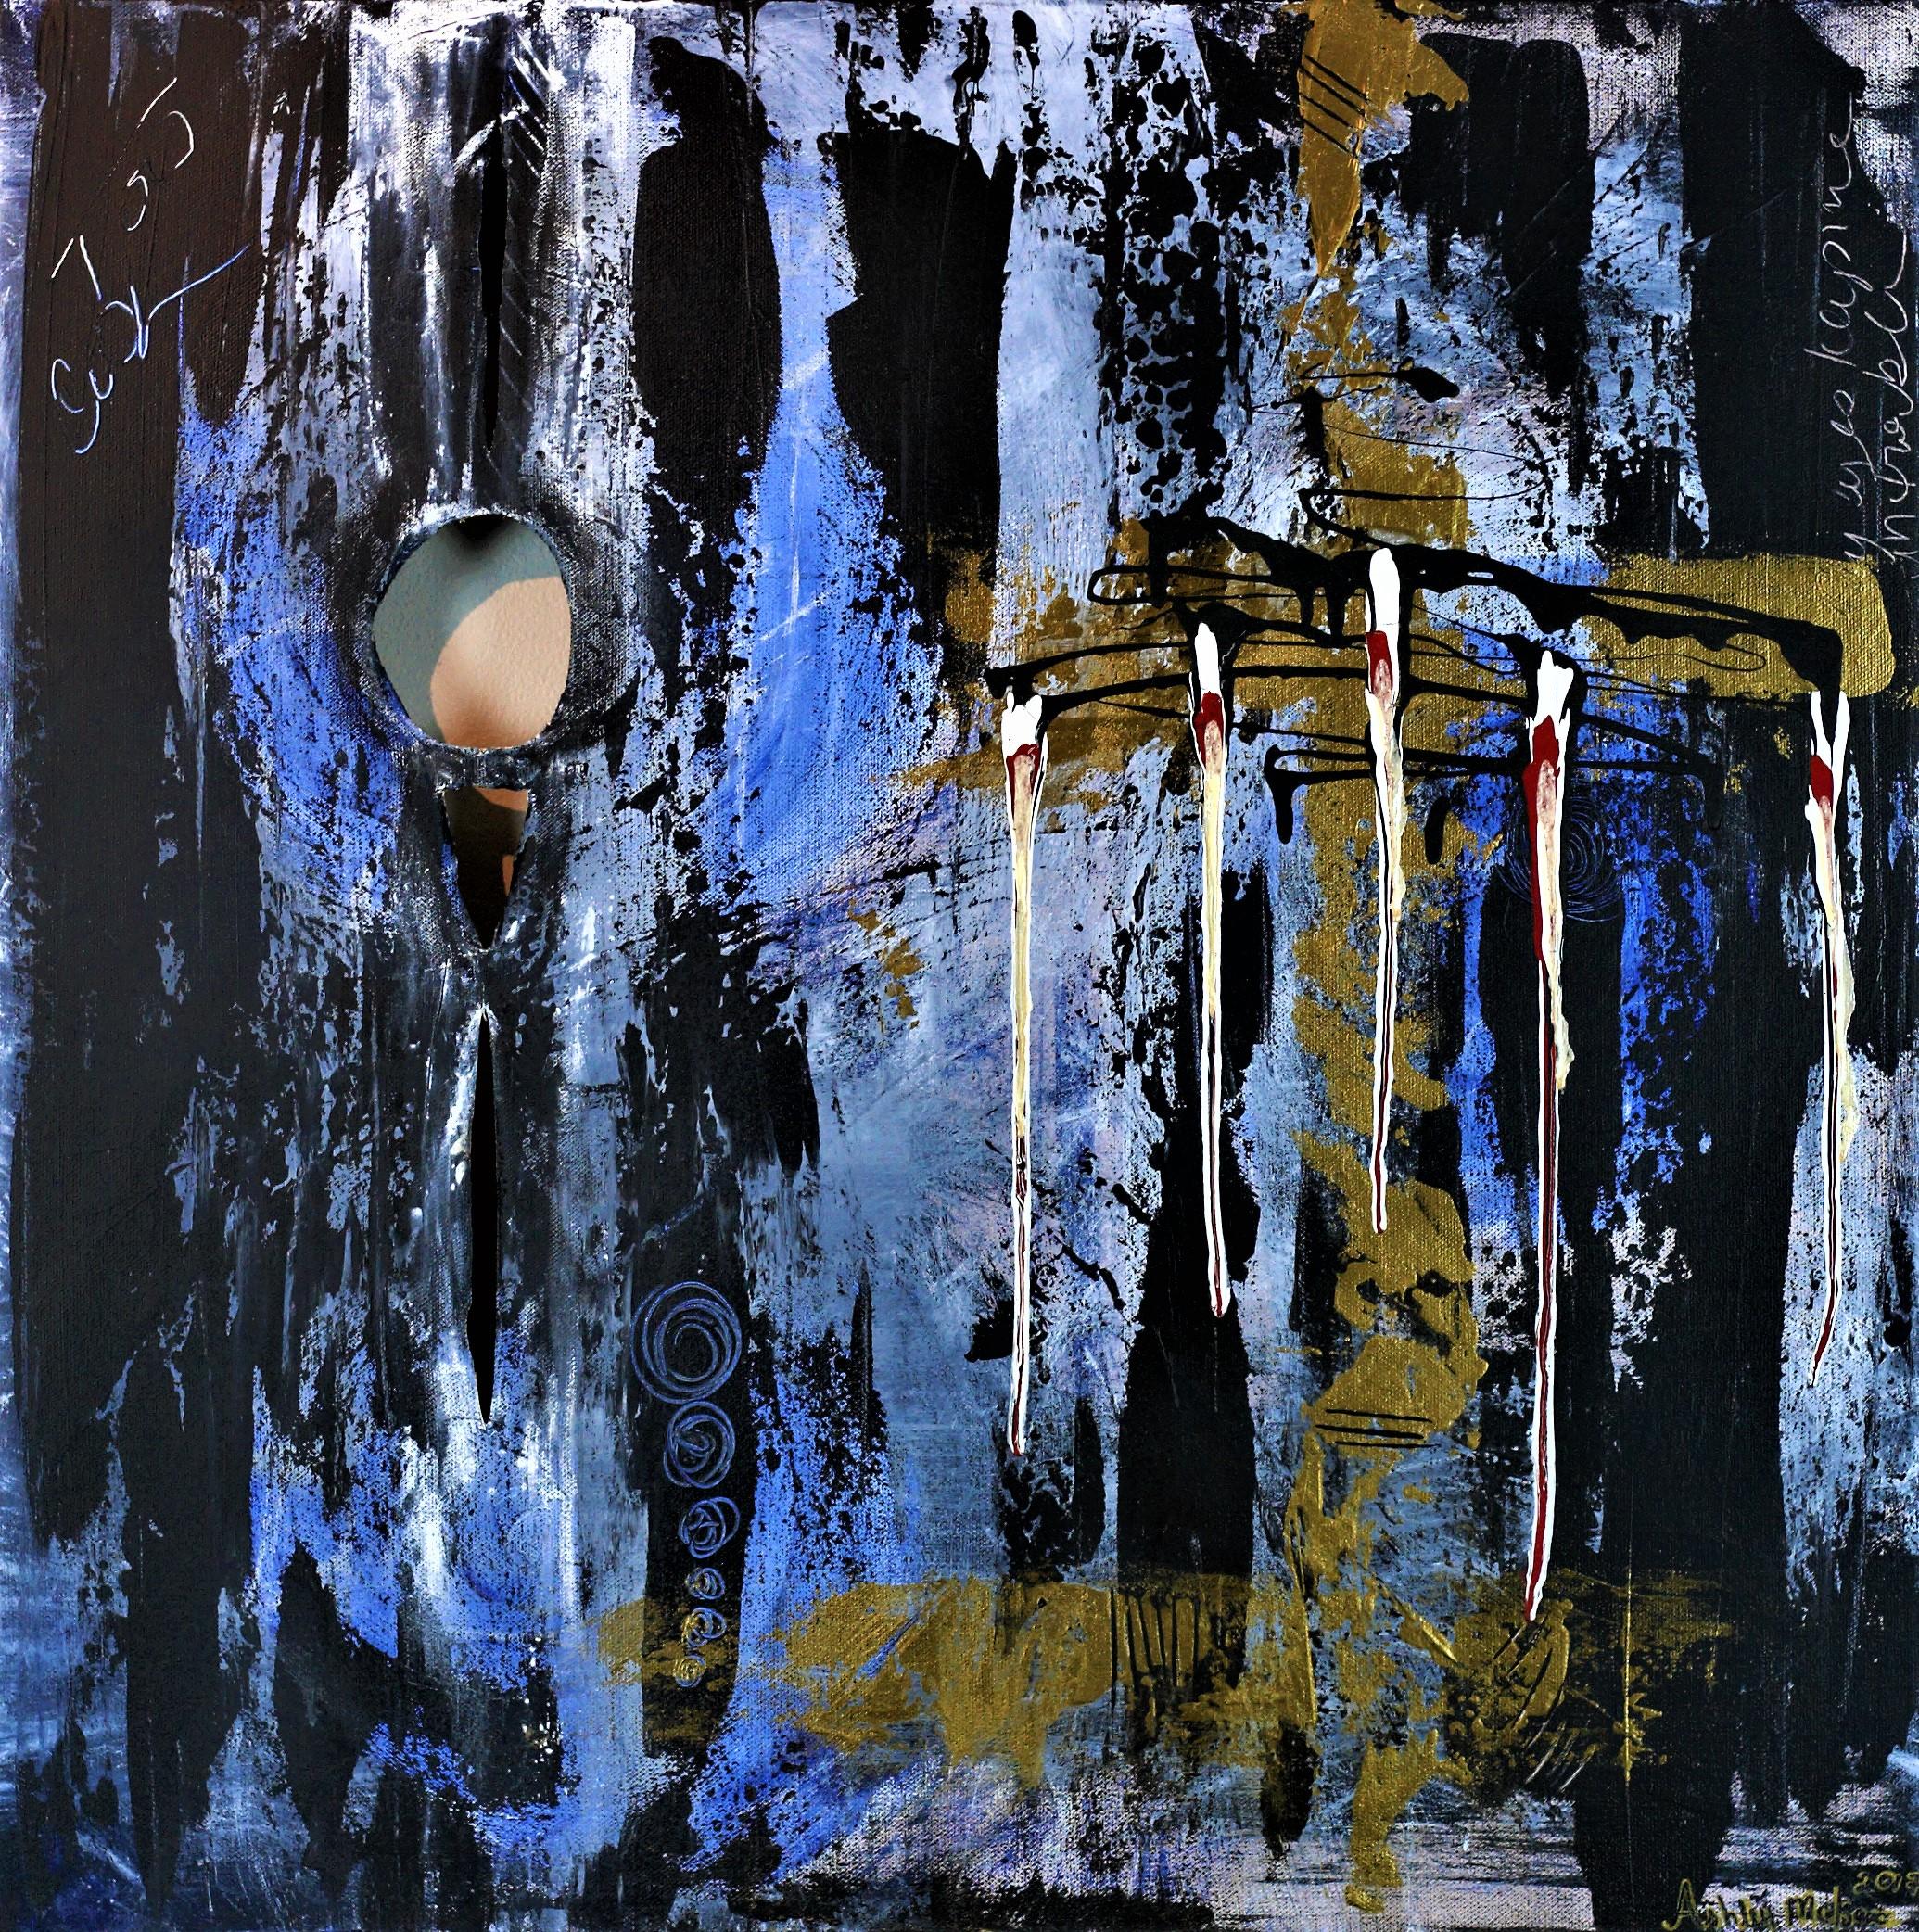 'Hello, Trouble' - David Wilcox - 24x24 - Edges Ultramarine, cut out holes - Copy.jpg